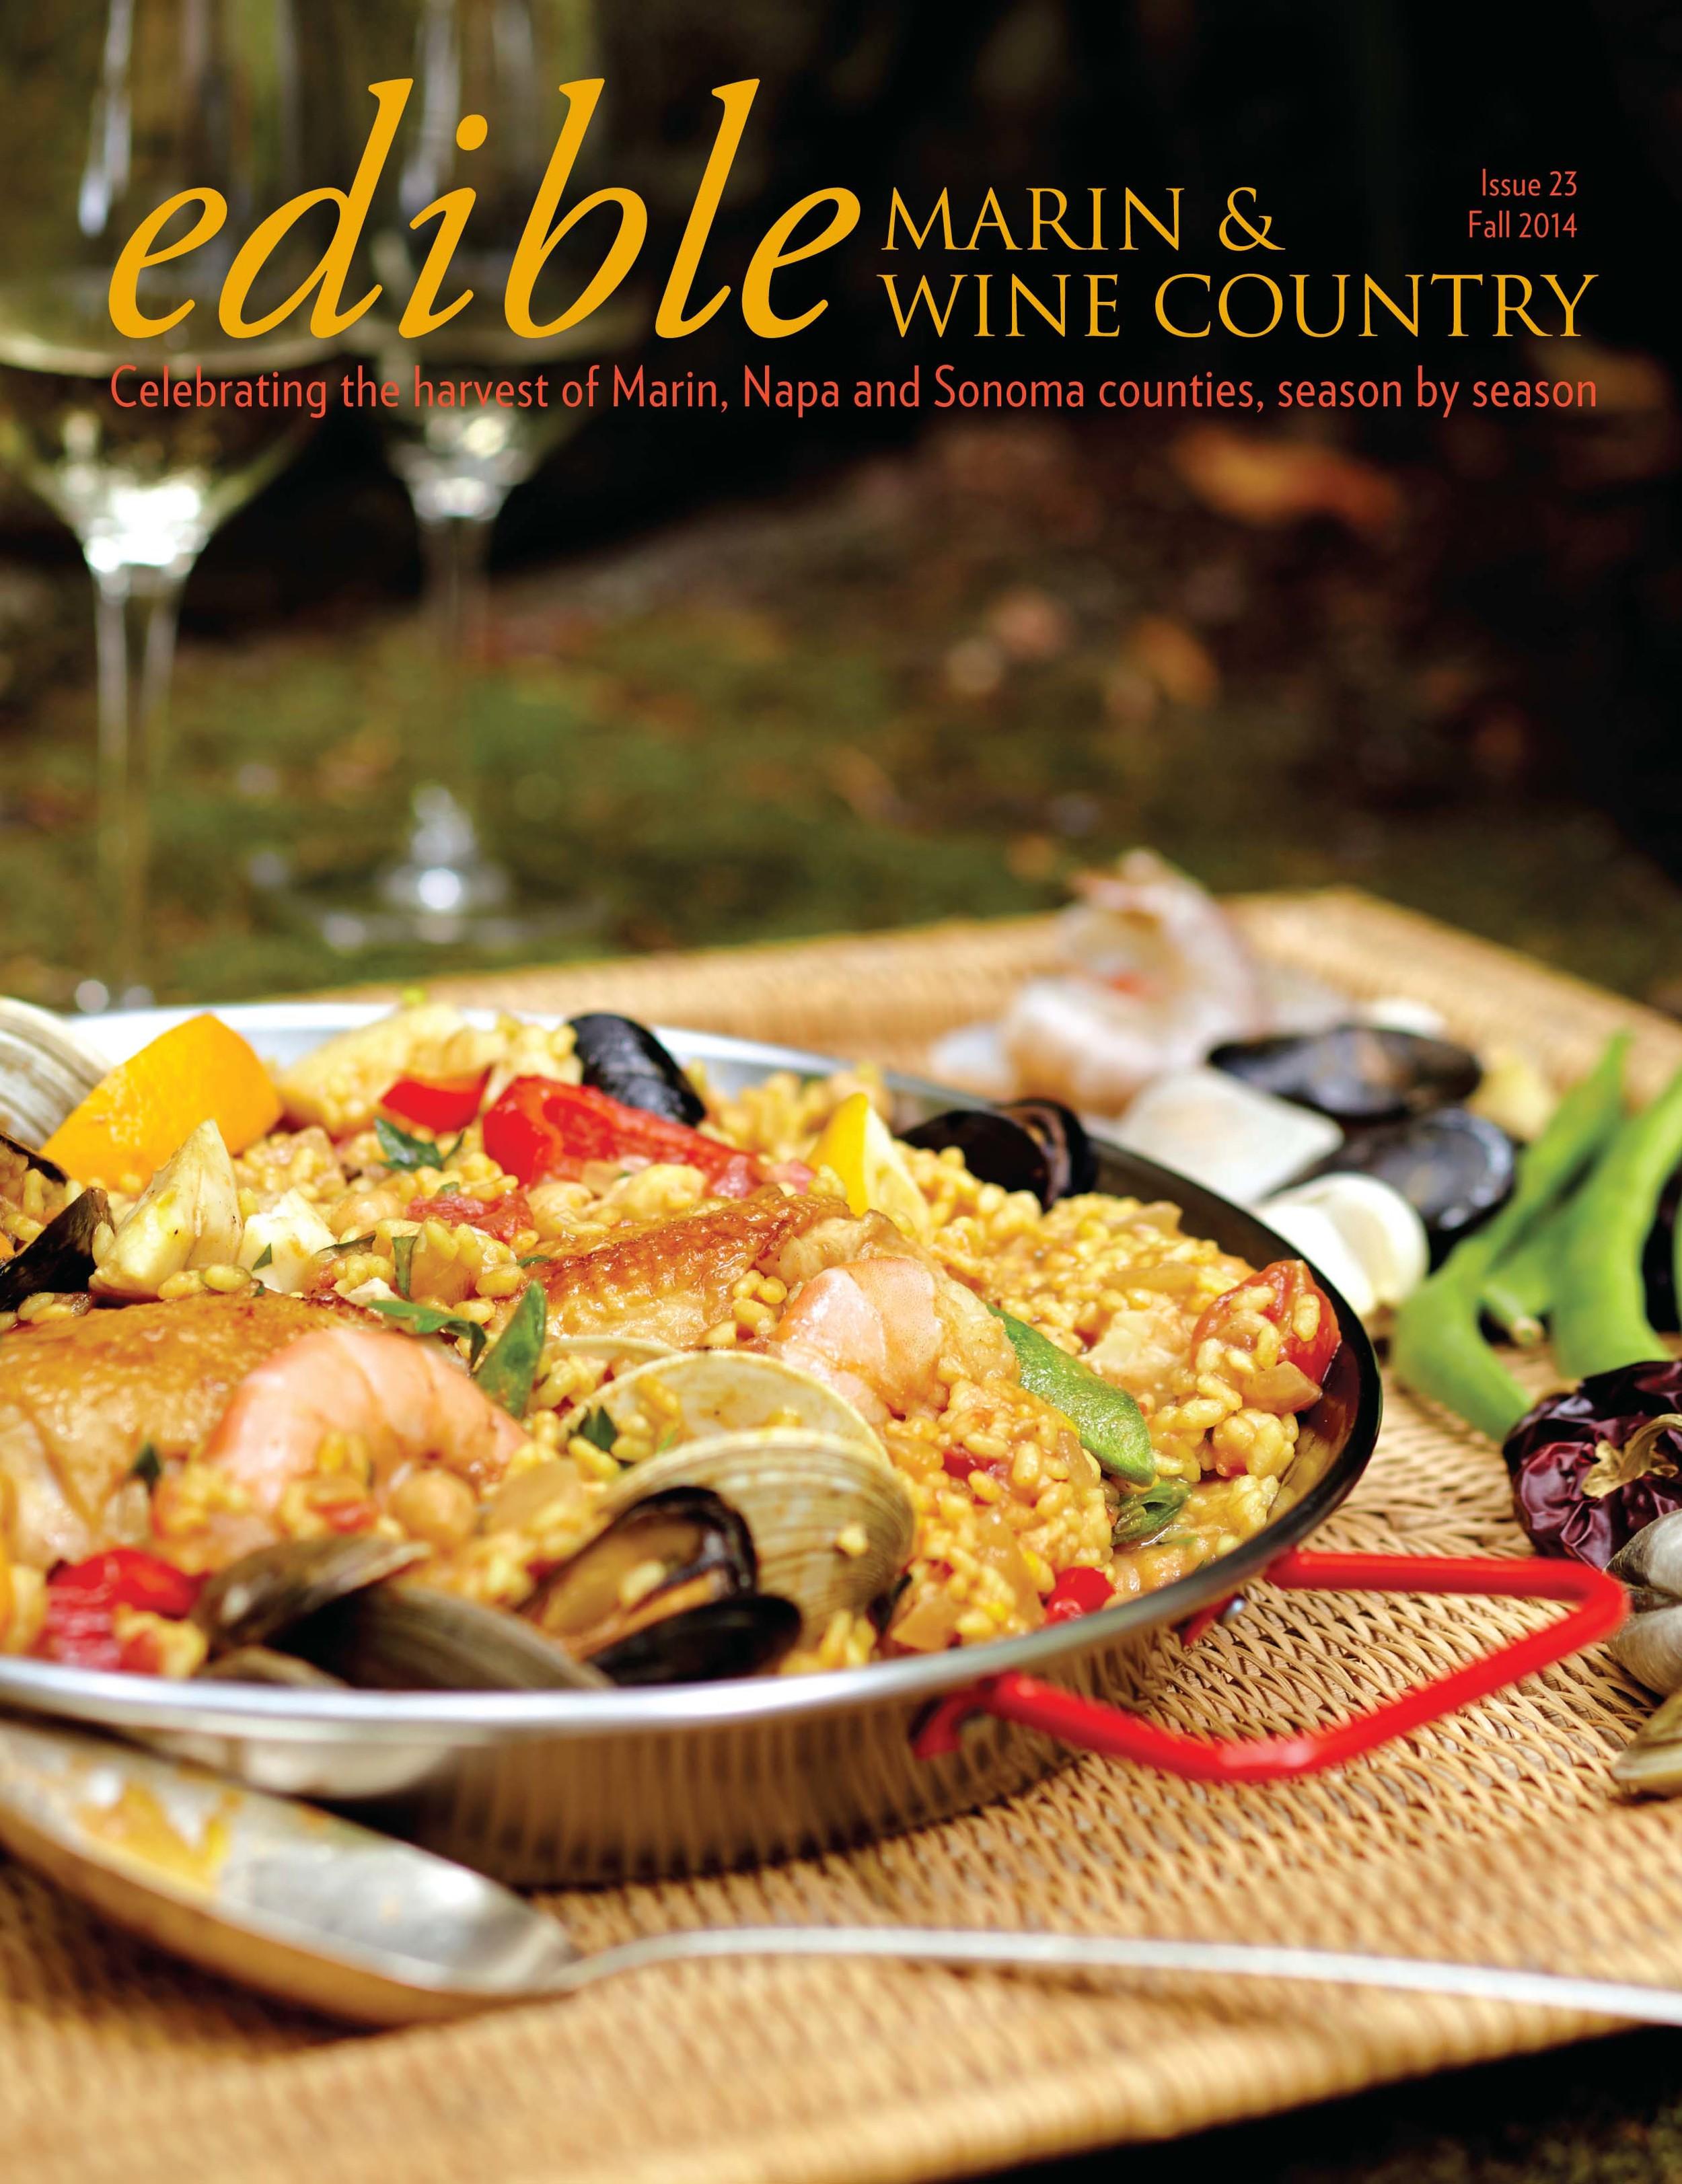 Edible Fall 2014 Cover.jpg